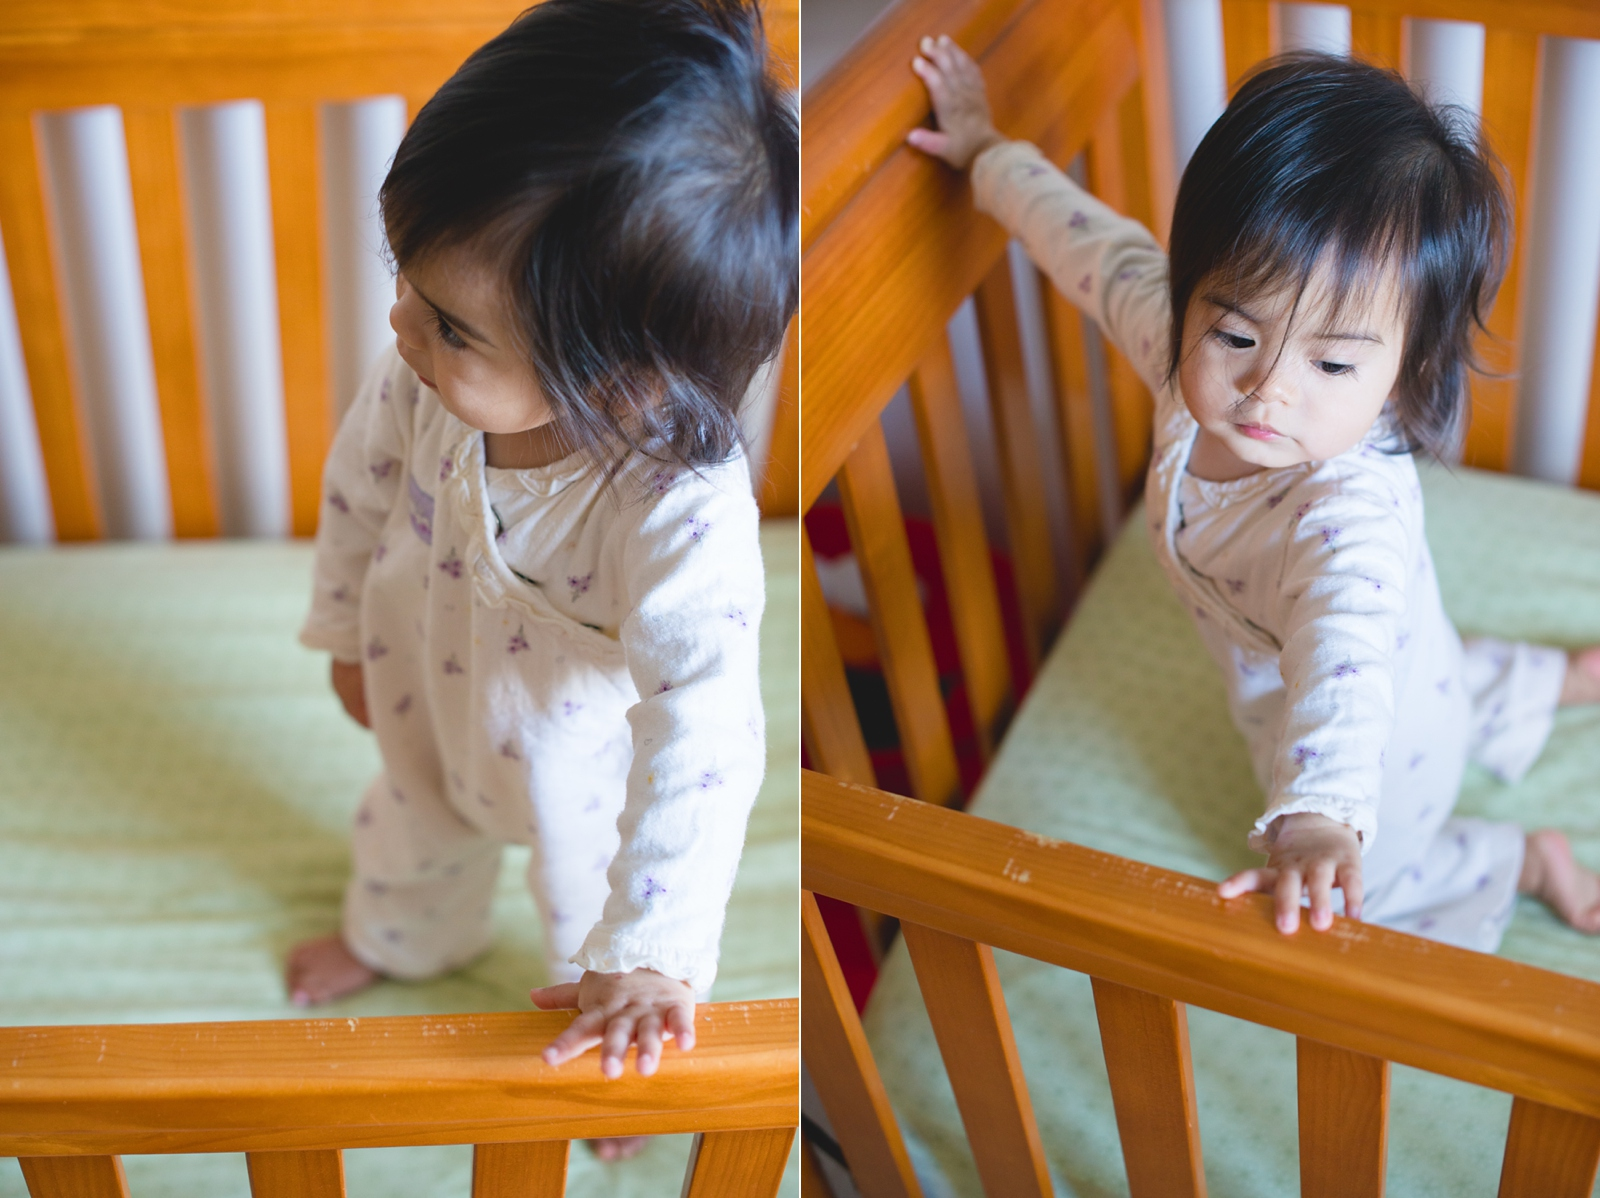 20130814-Amelia Stands in Crib-BLOGGrid_0007.jpg